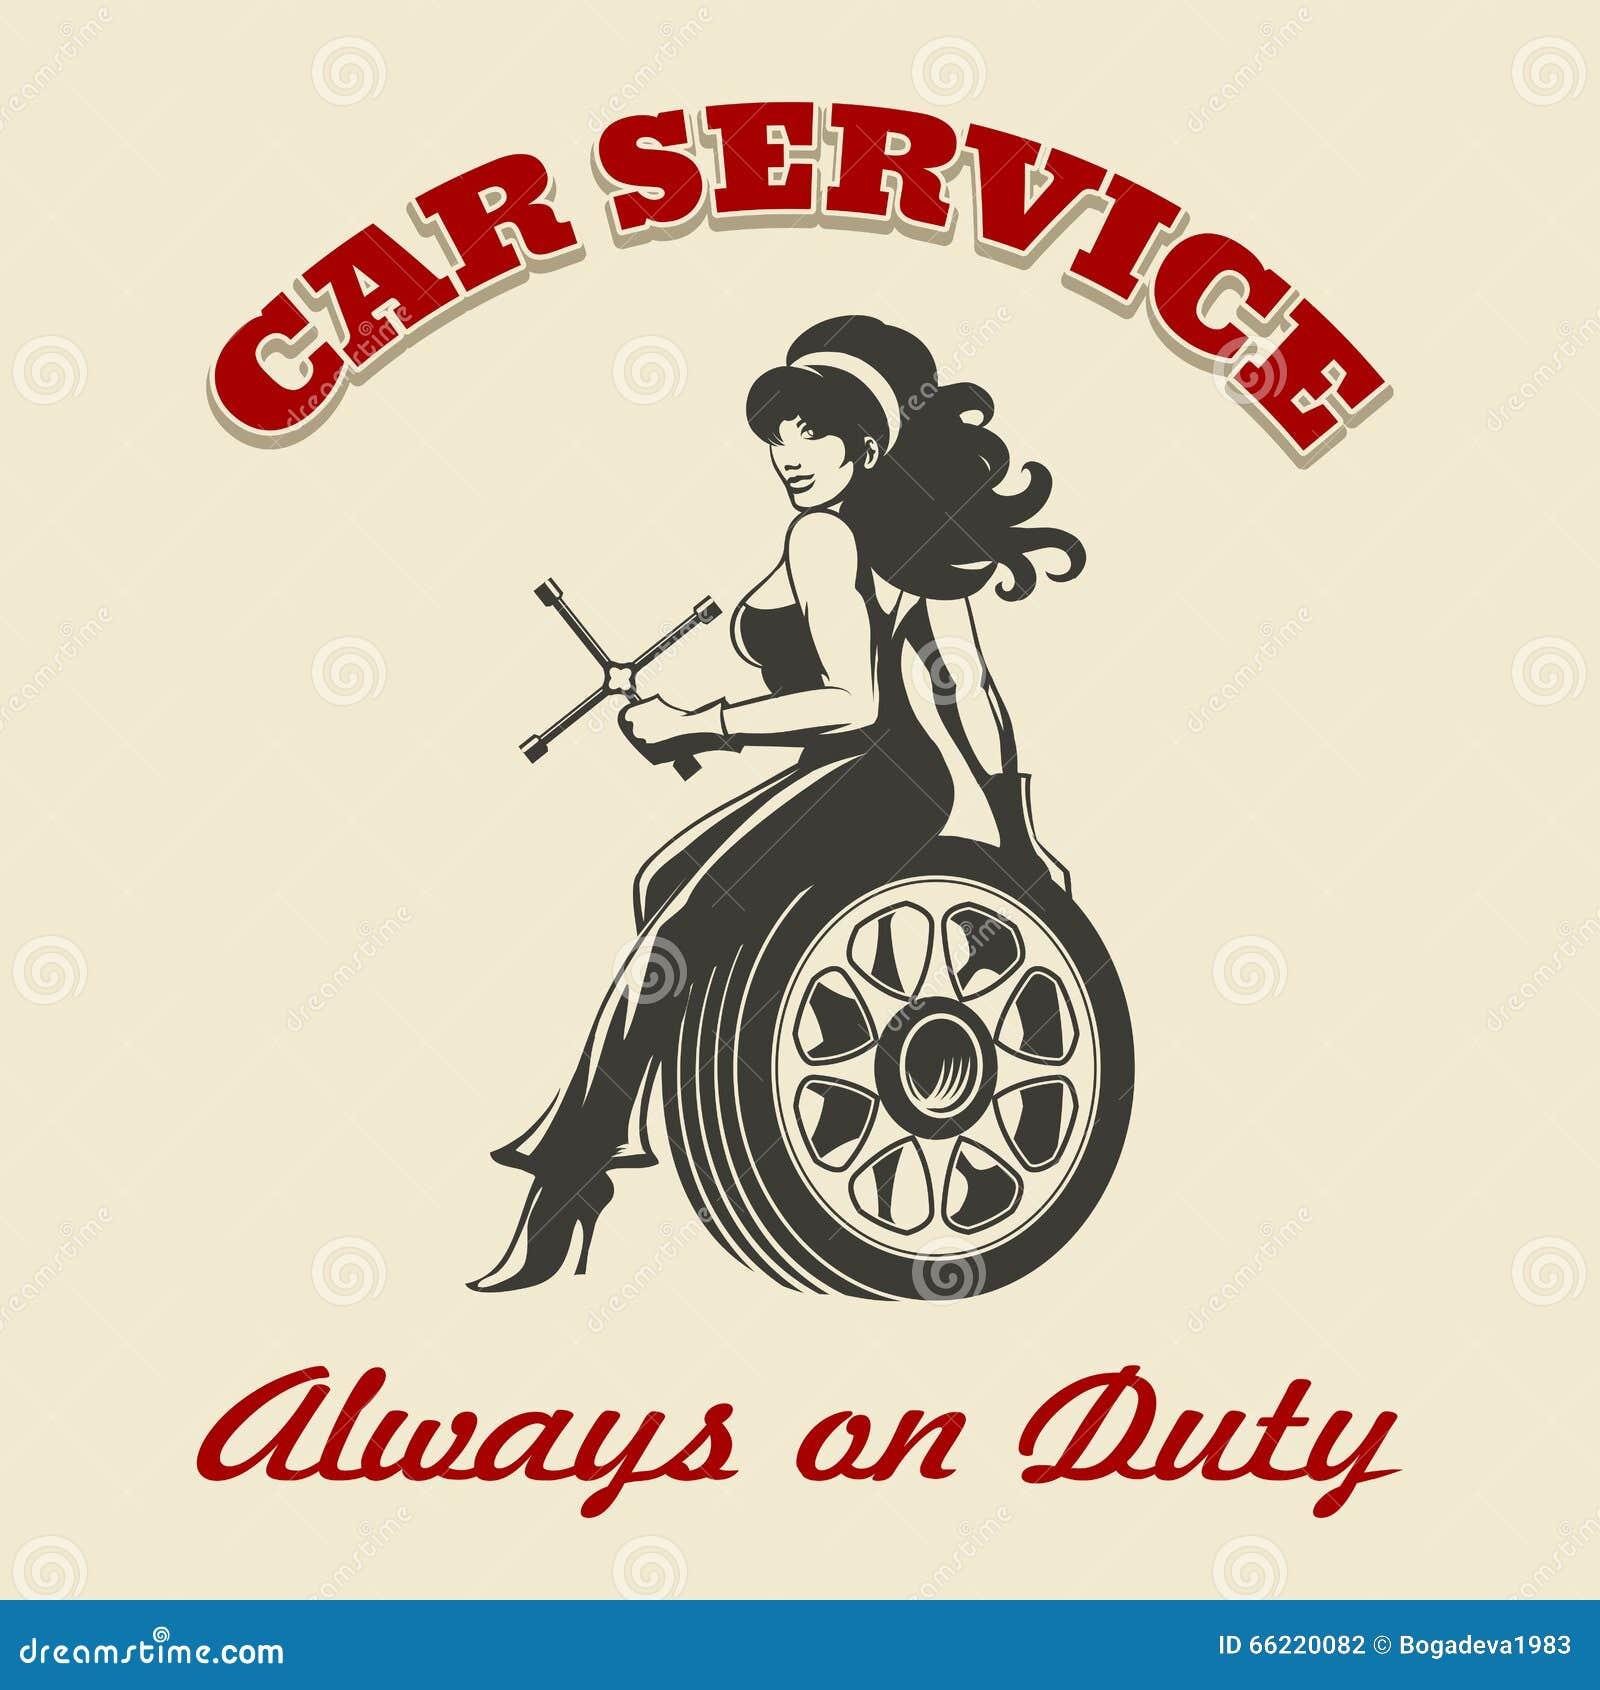 Cyber monday car service car service retro poster stock for Kewanee motor lodge kewanee il